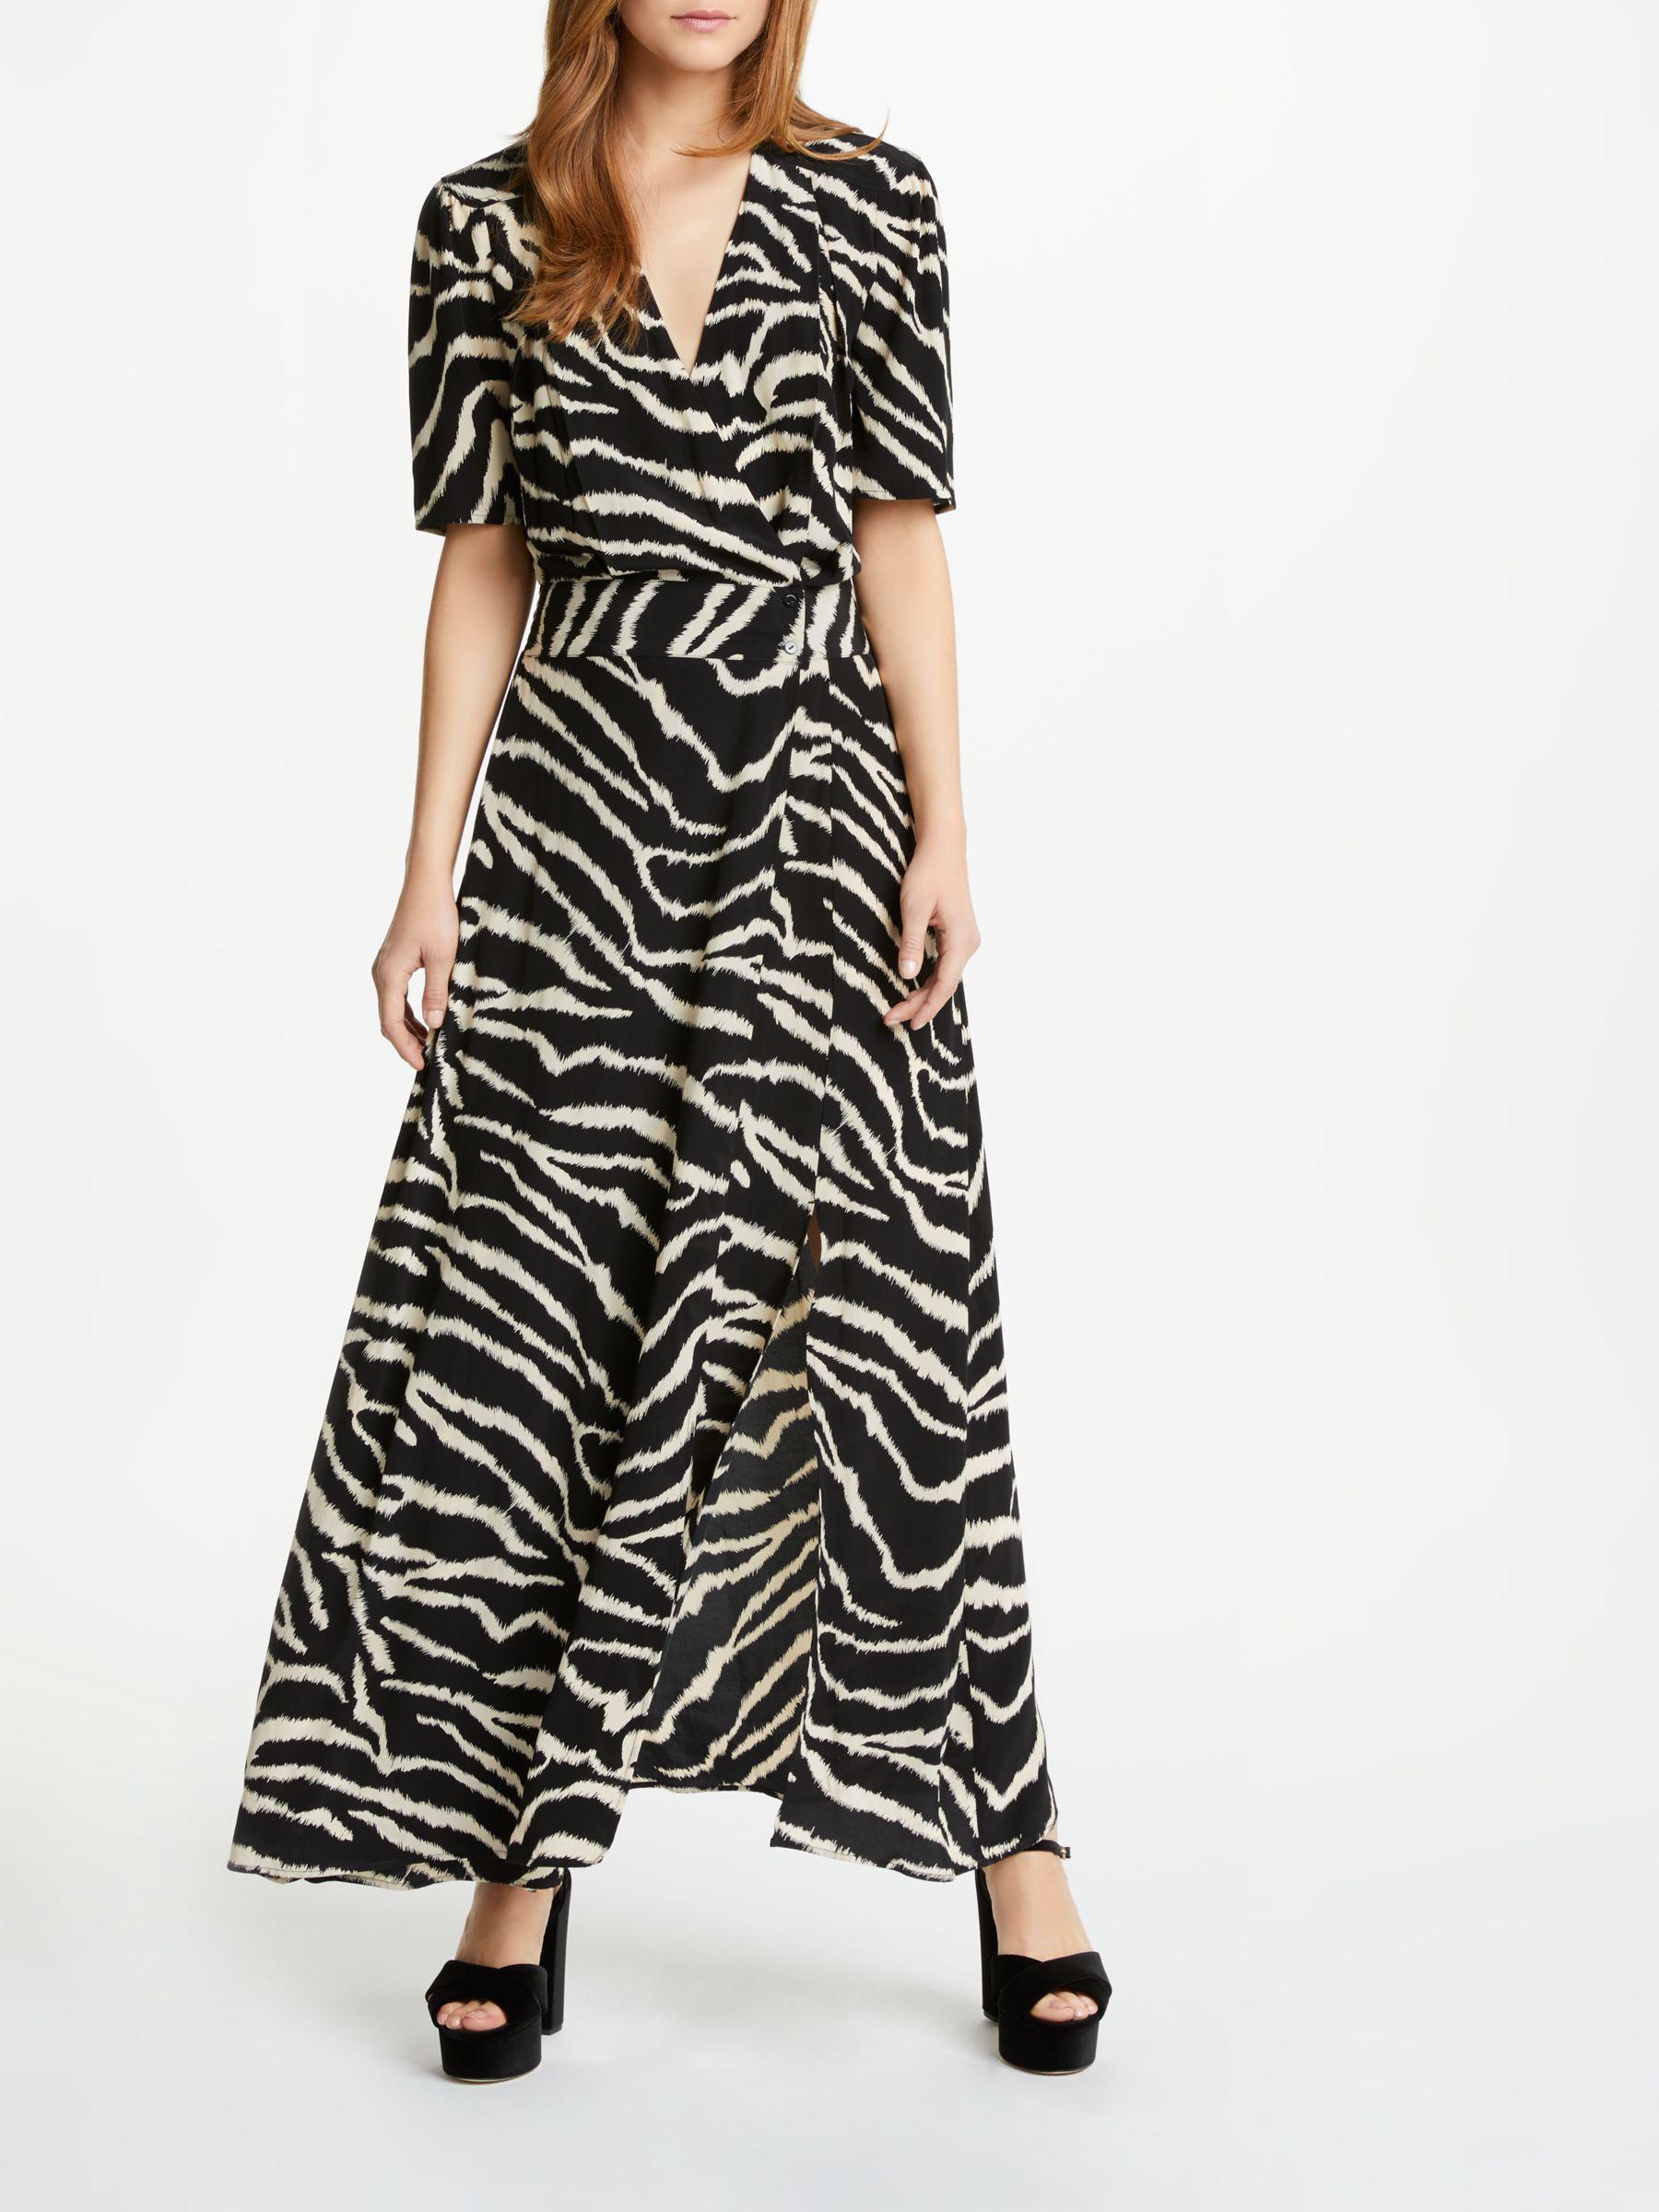 Somerset by Alice Temperley Zebra Print Wrap Maxi Dress in Black - Lyst fb8e8955d